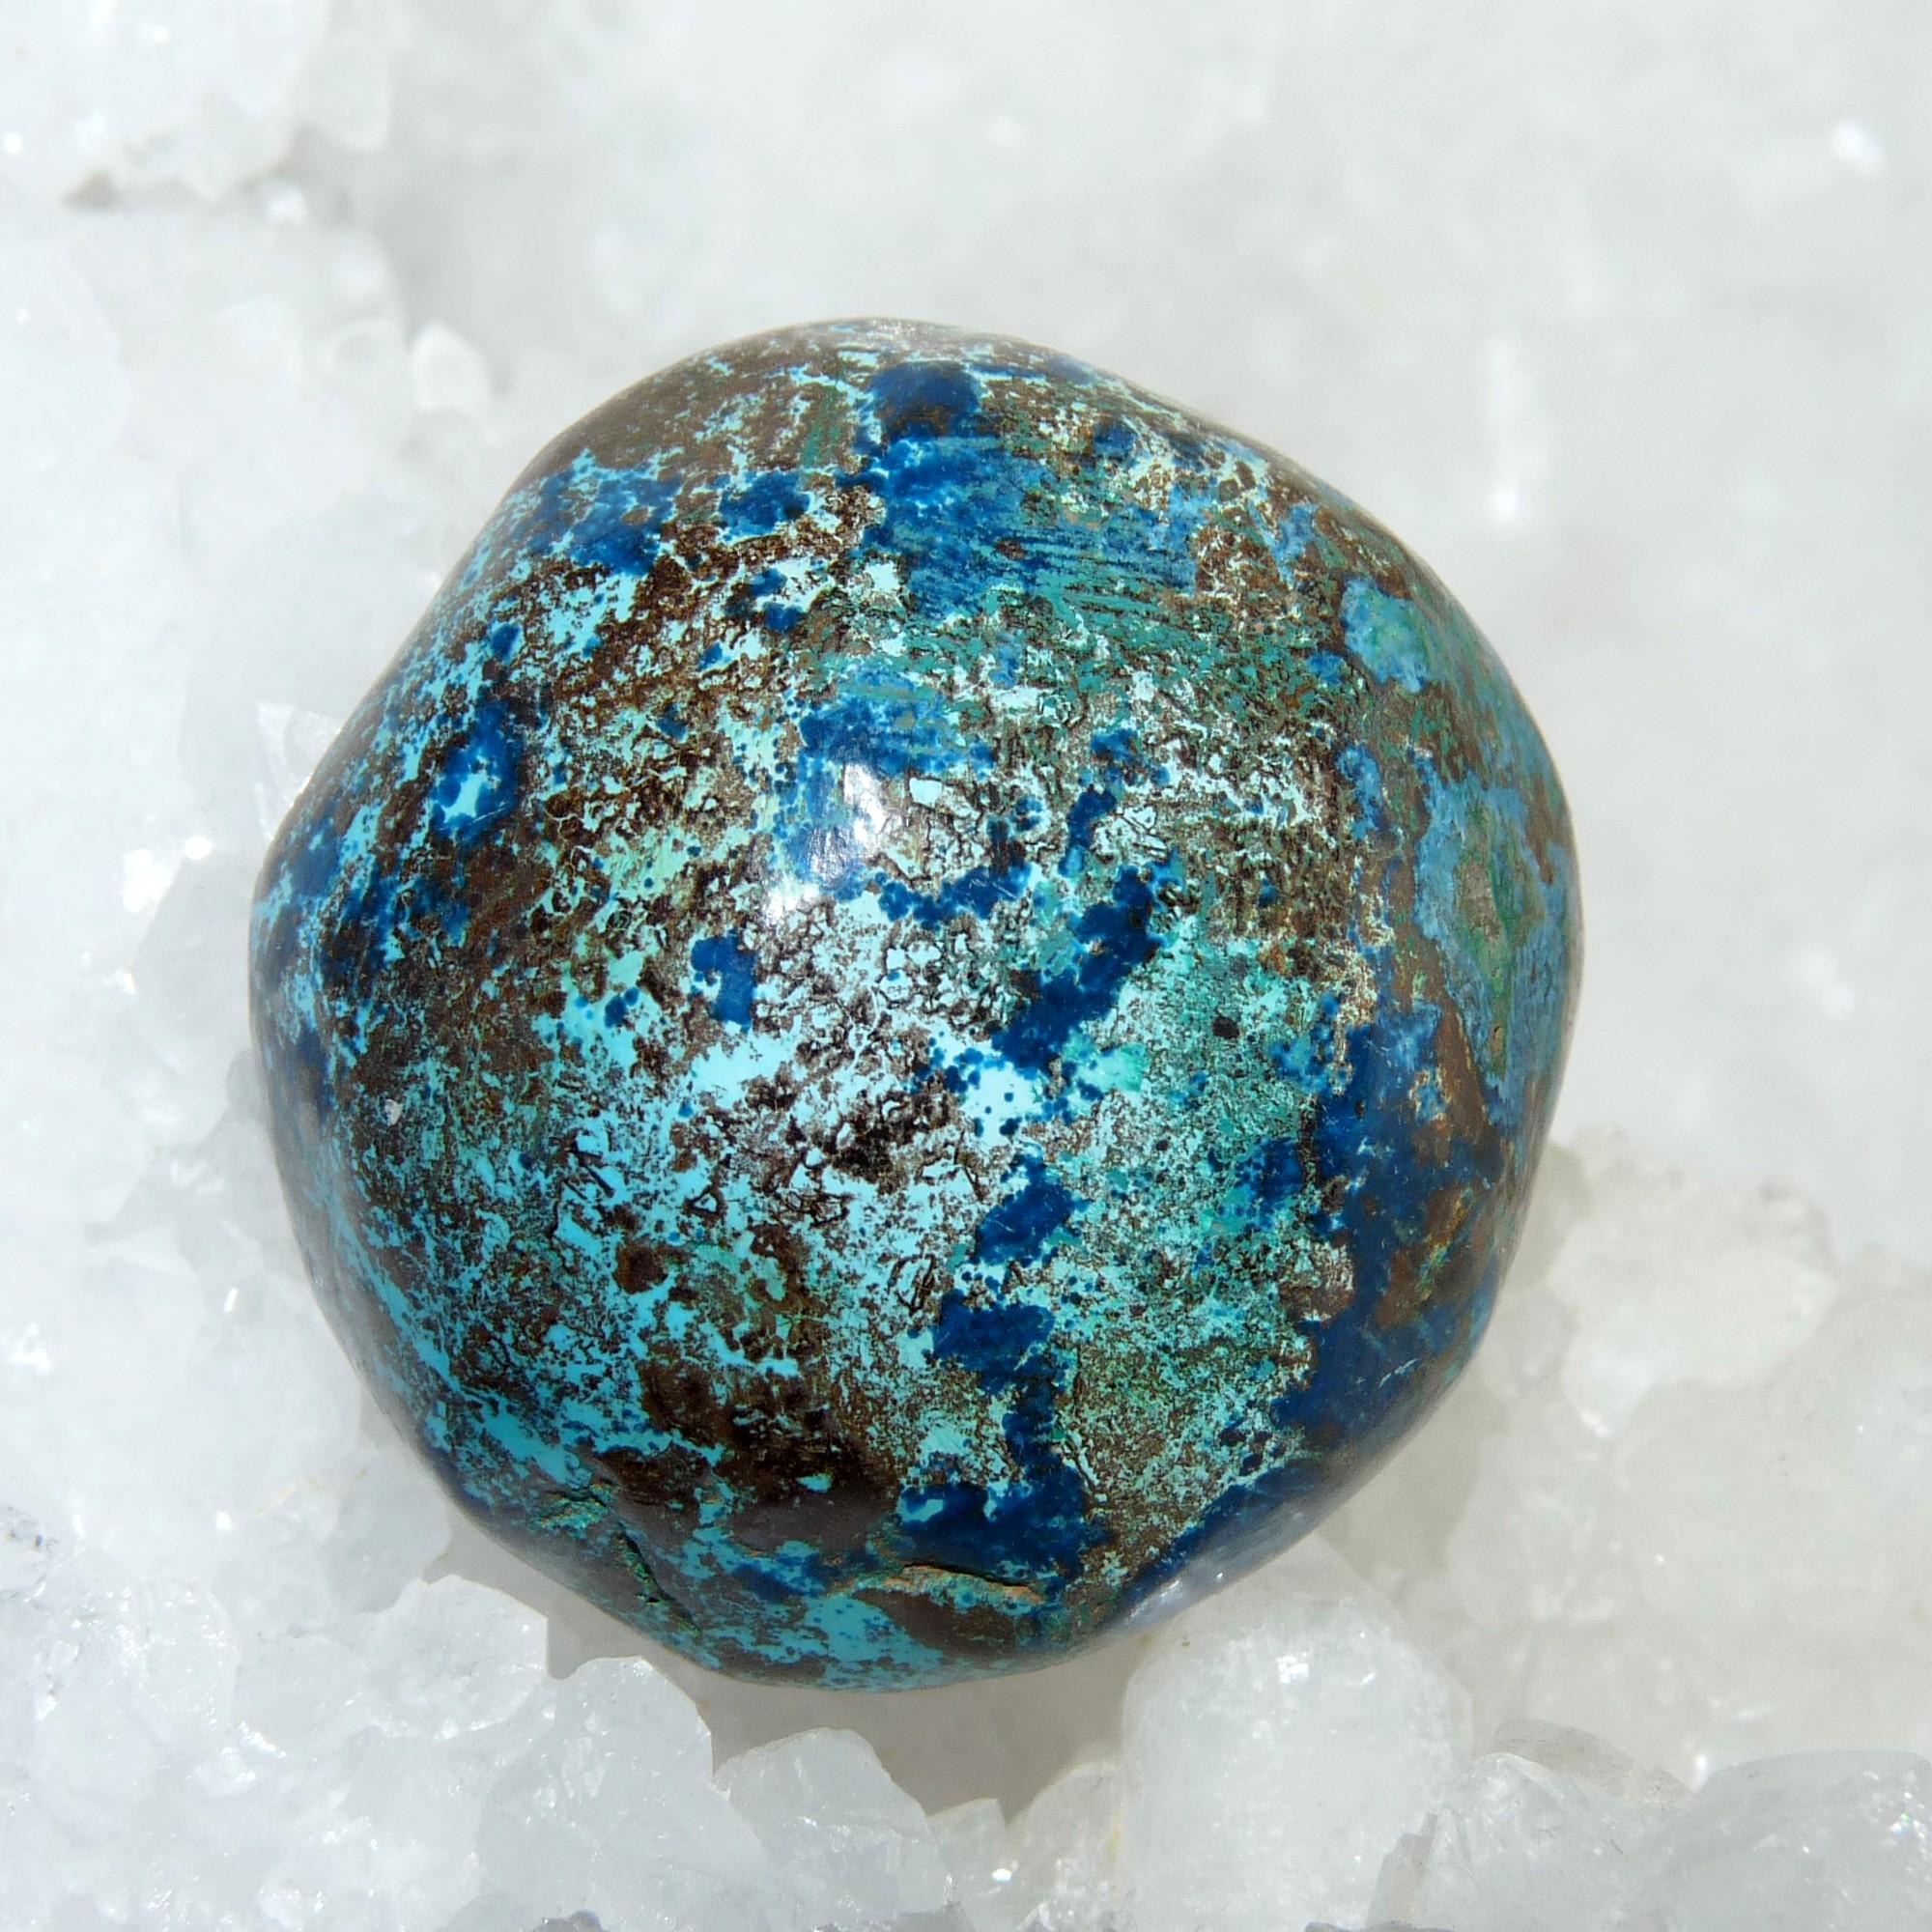 shattuckite-chrysocolle